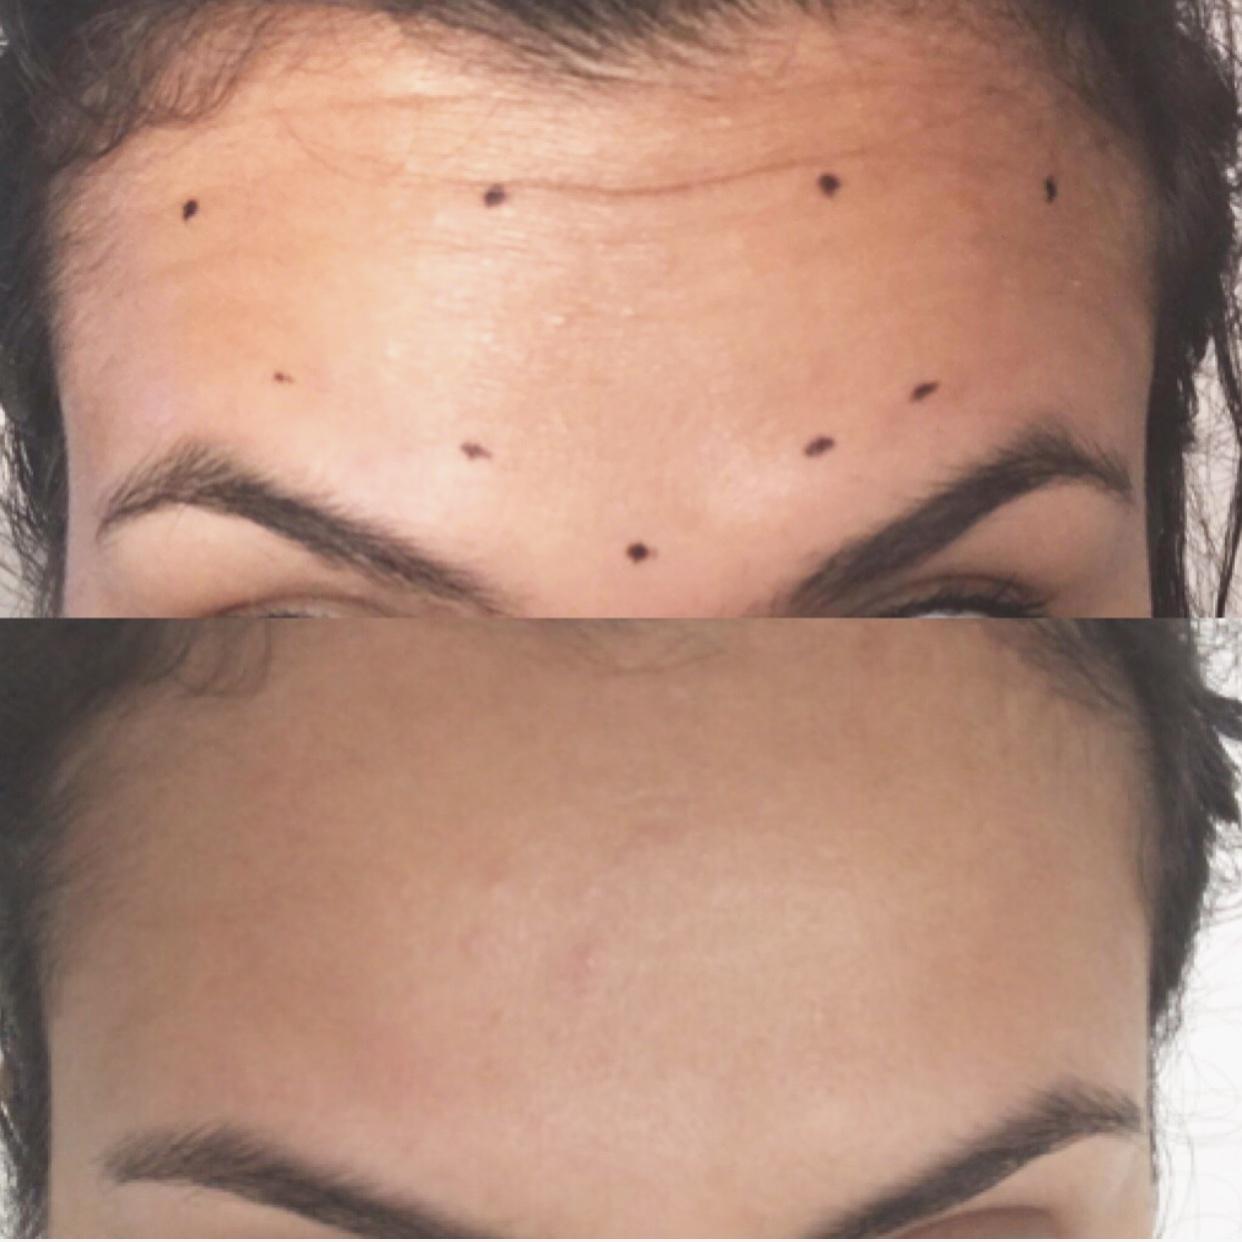 30 units of Botox